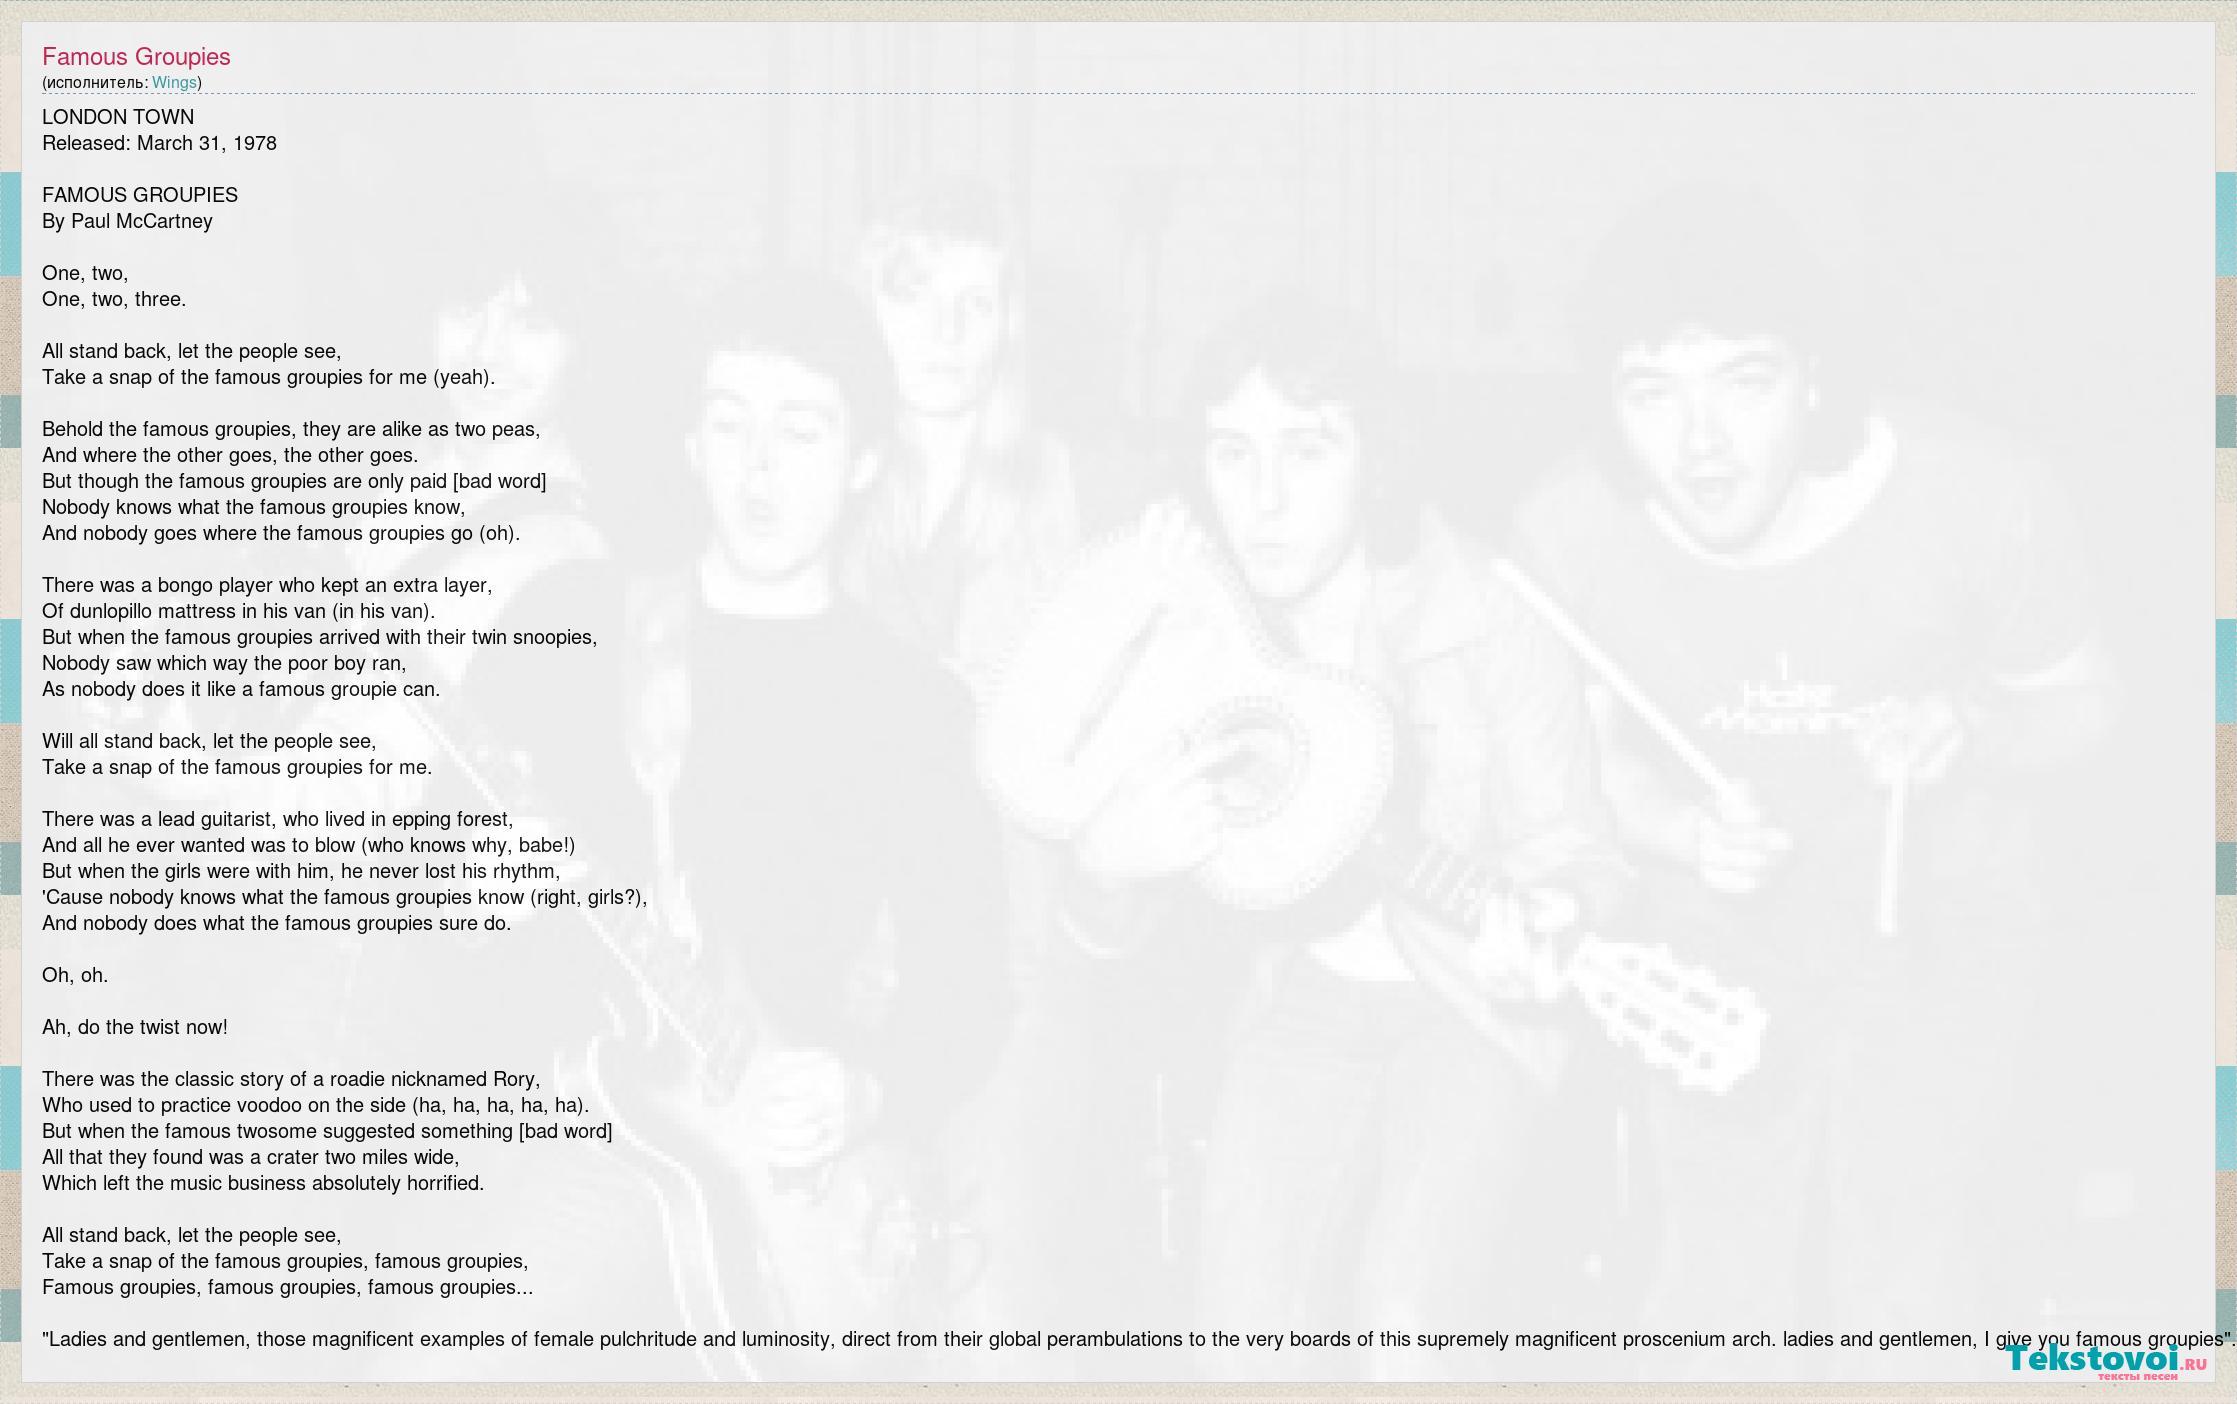 Wings: Famous Groupies слова песни